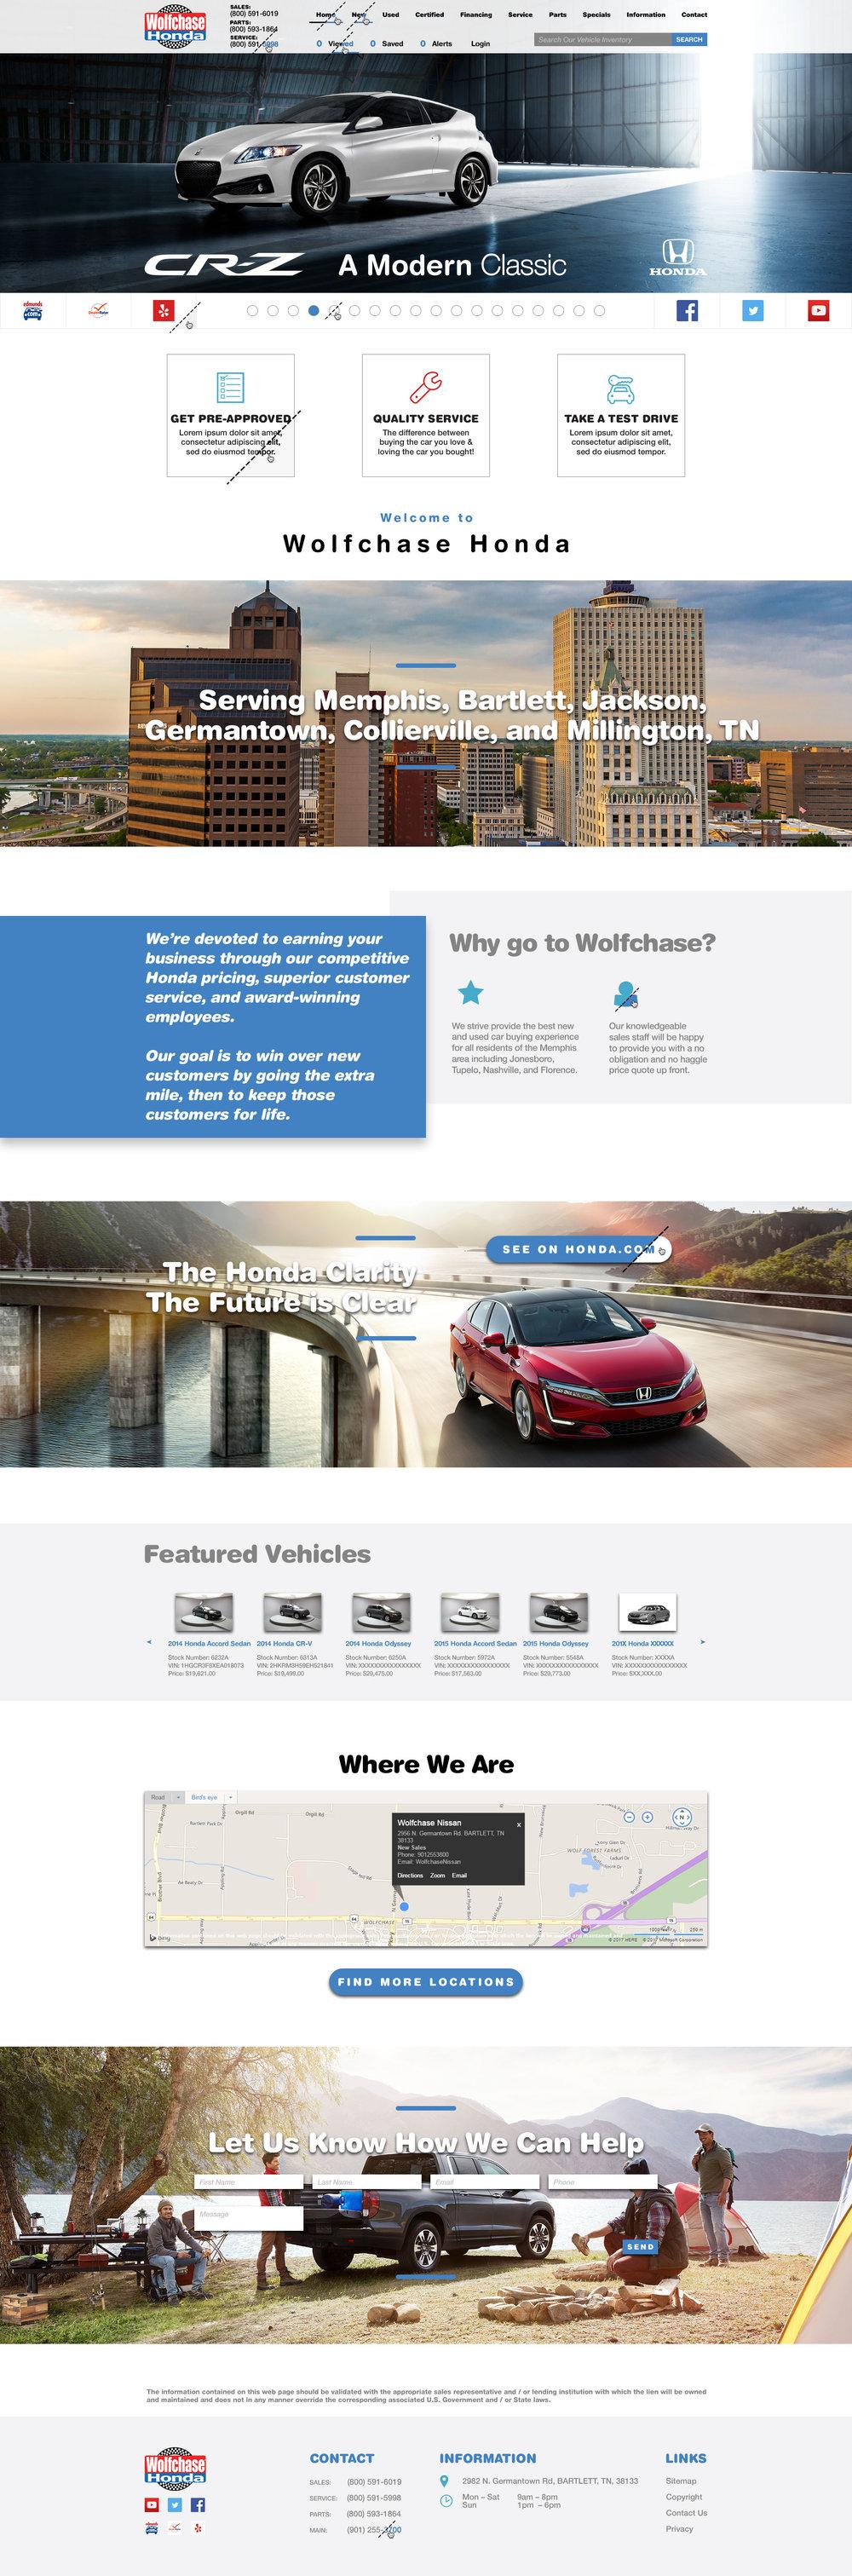 Home Page_Honda_Version 2_Wolfchase Nissan_Custom Skin.jpg